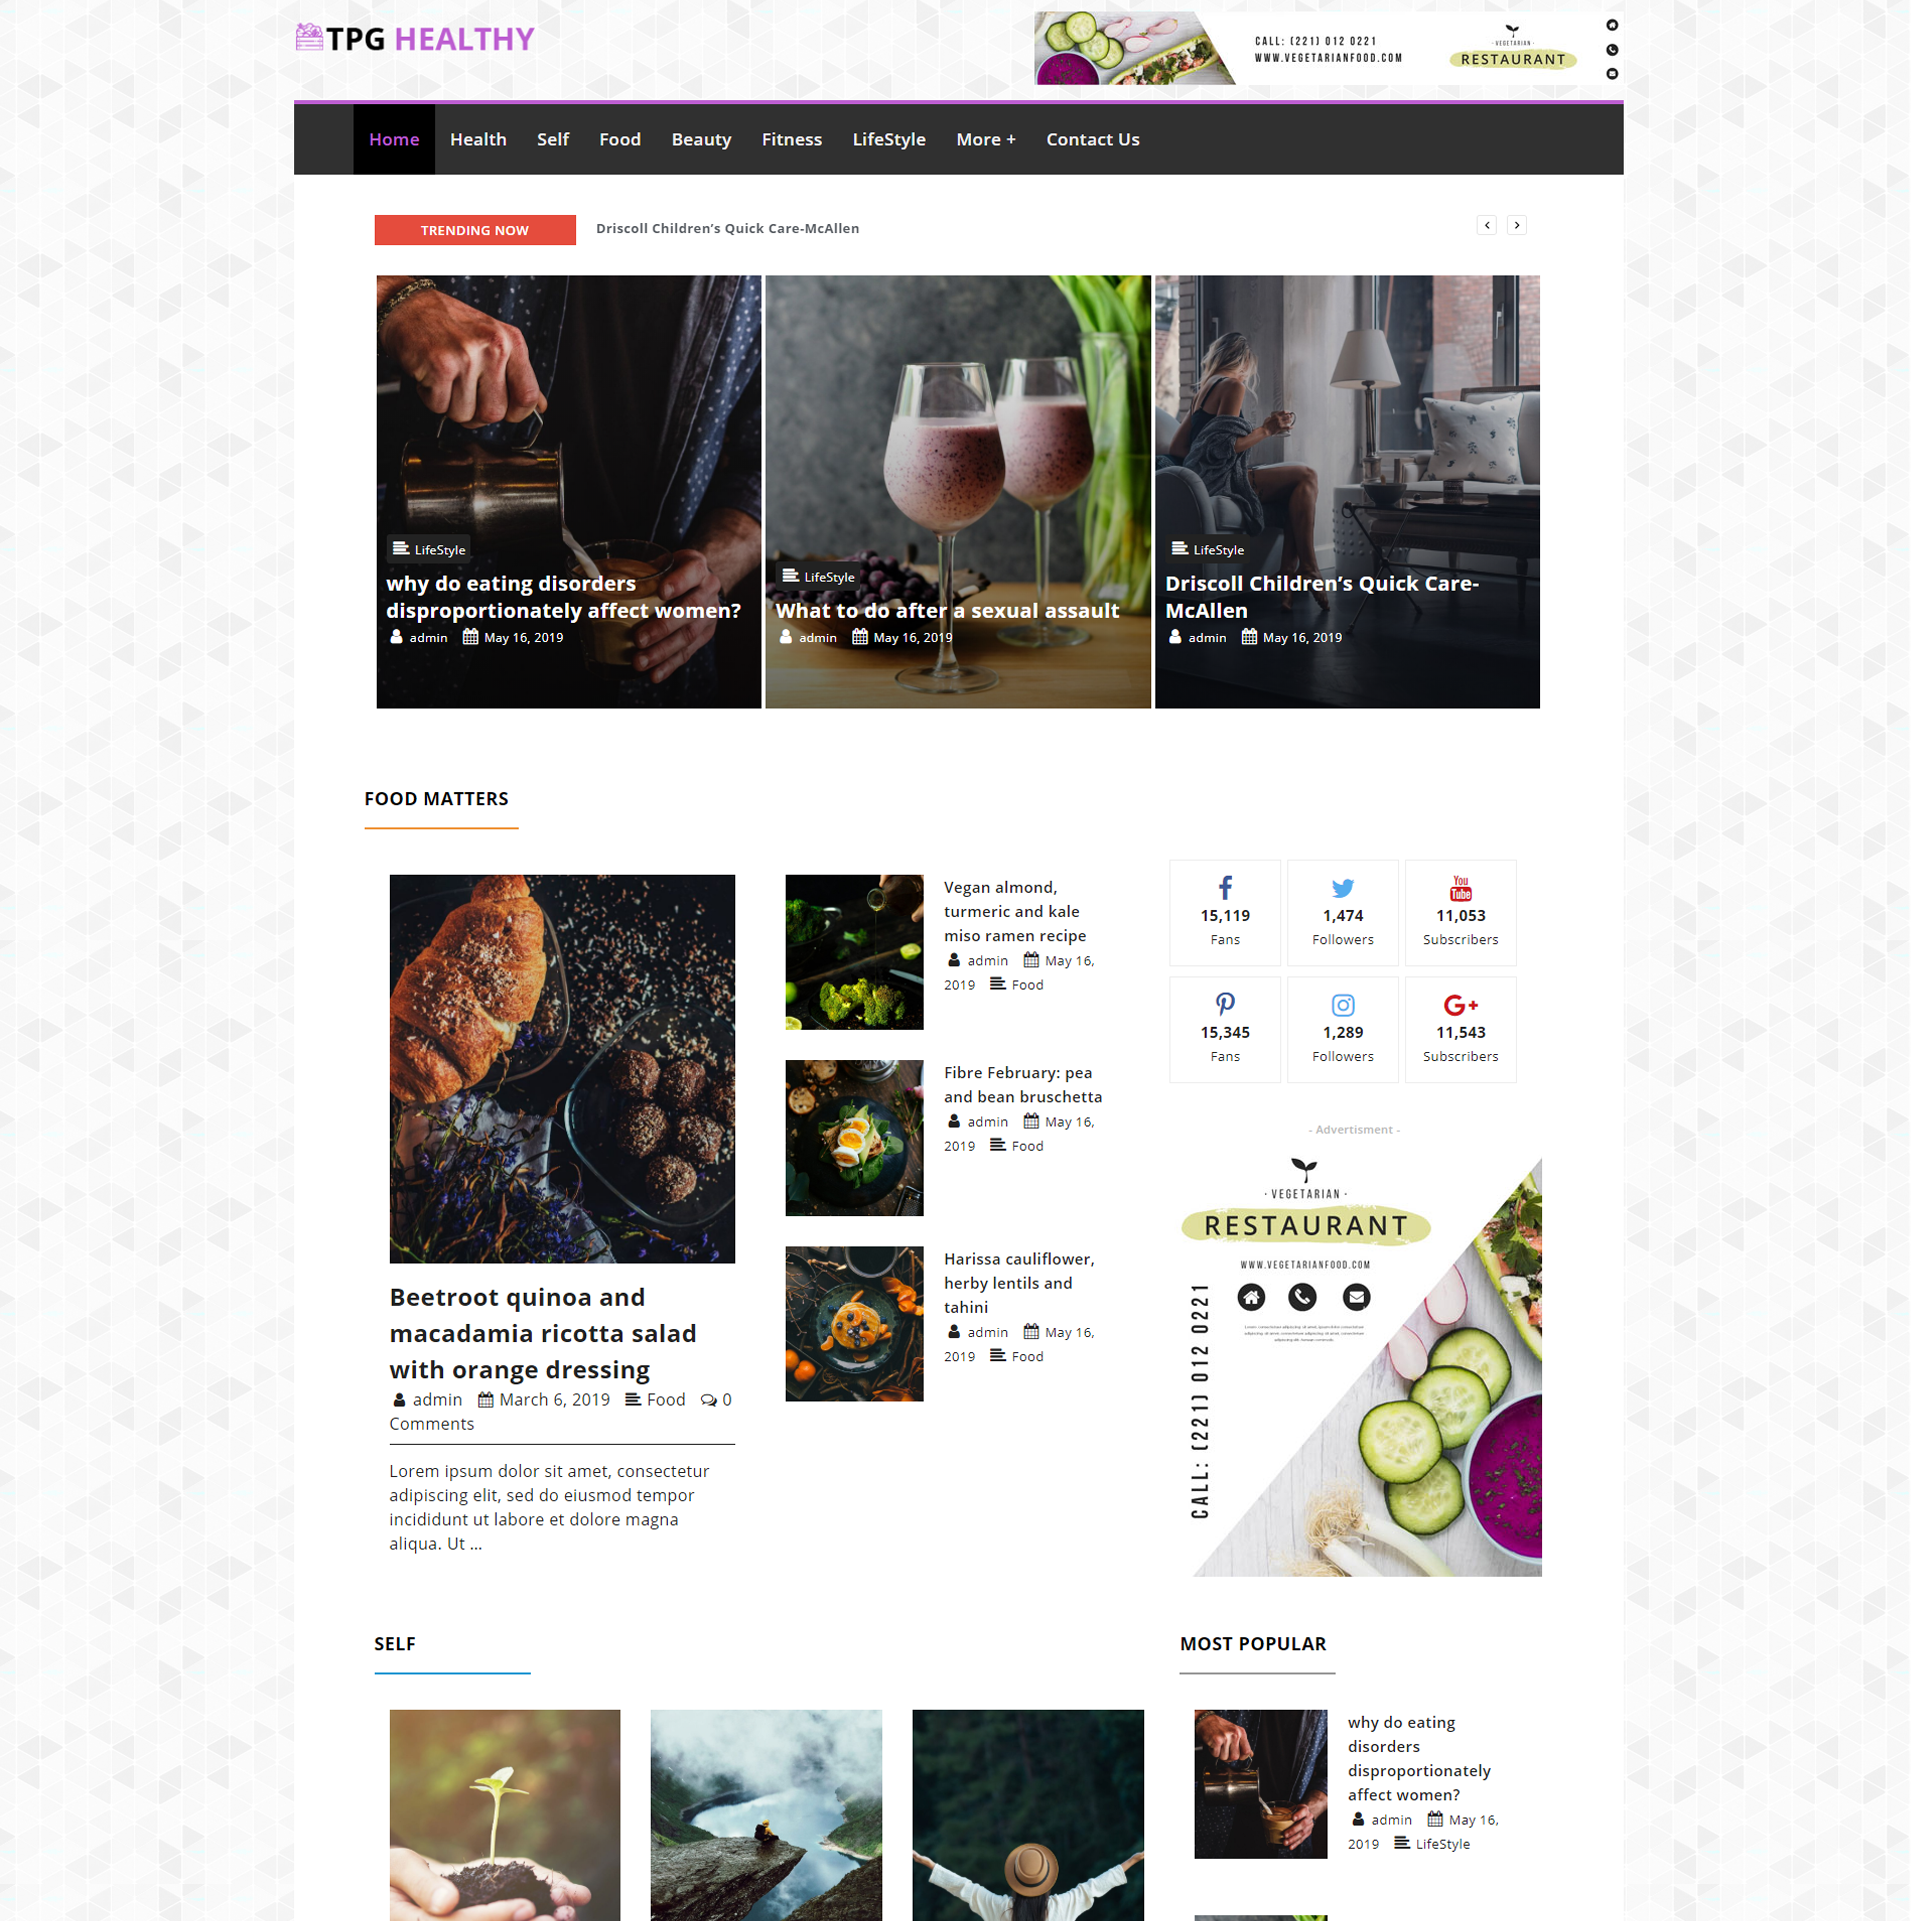 tpg-healthy-free-responsive-wordpress-theme-screenshot